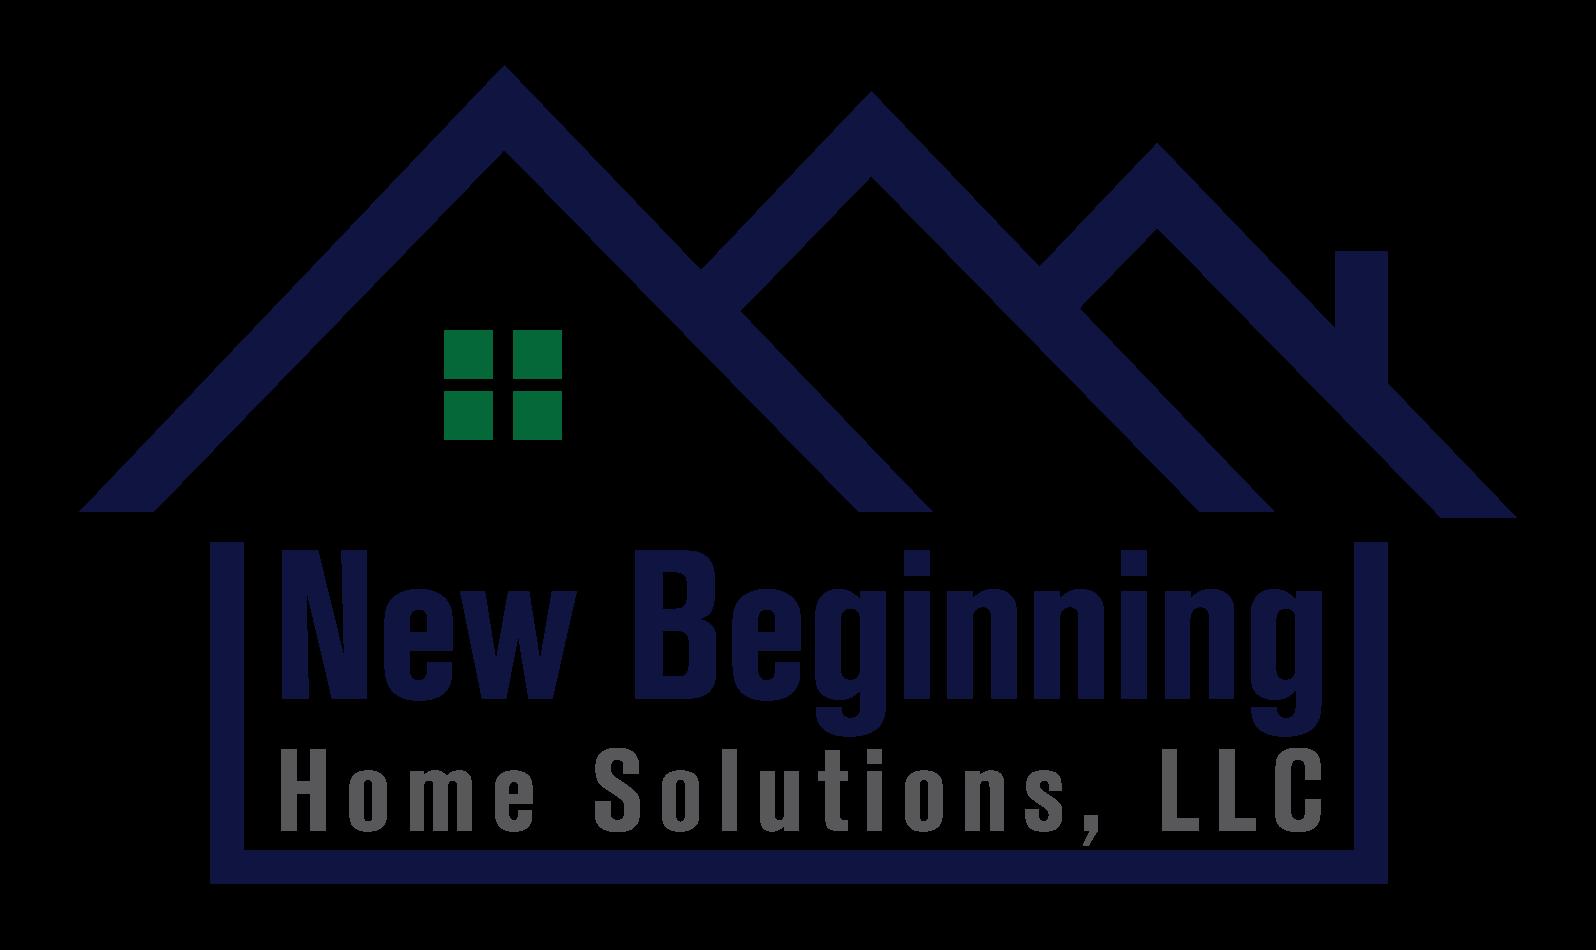 New Beginning Home Solutions, LLC